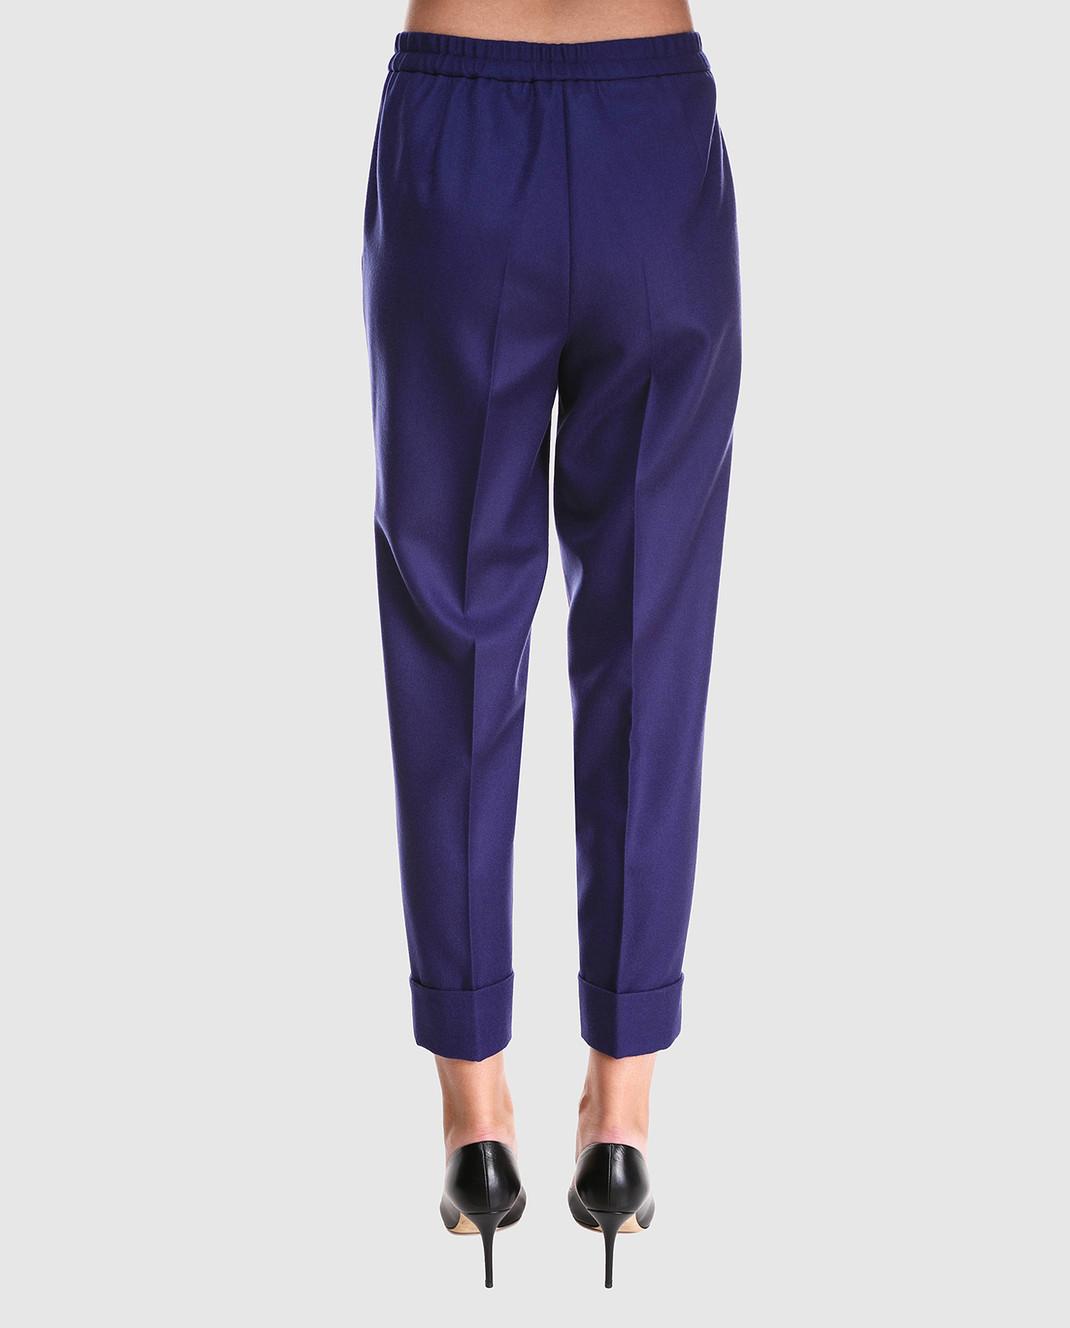 Bottega Veneta Синие брюки 513214 изображение 4